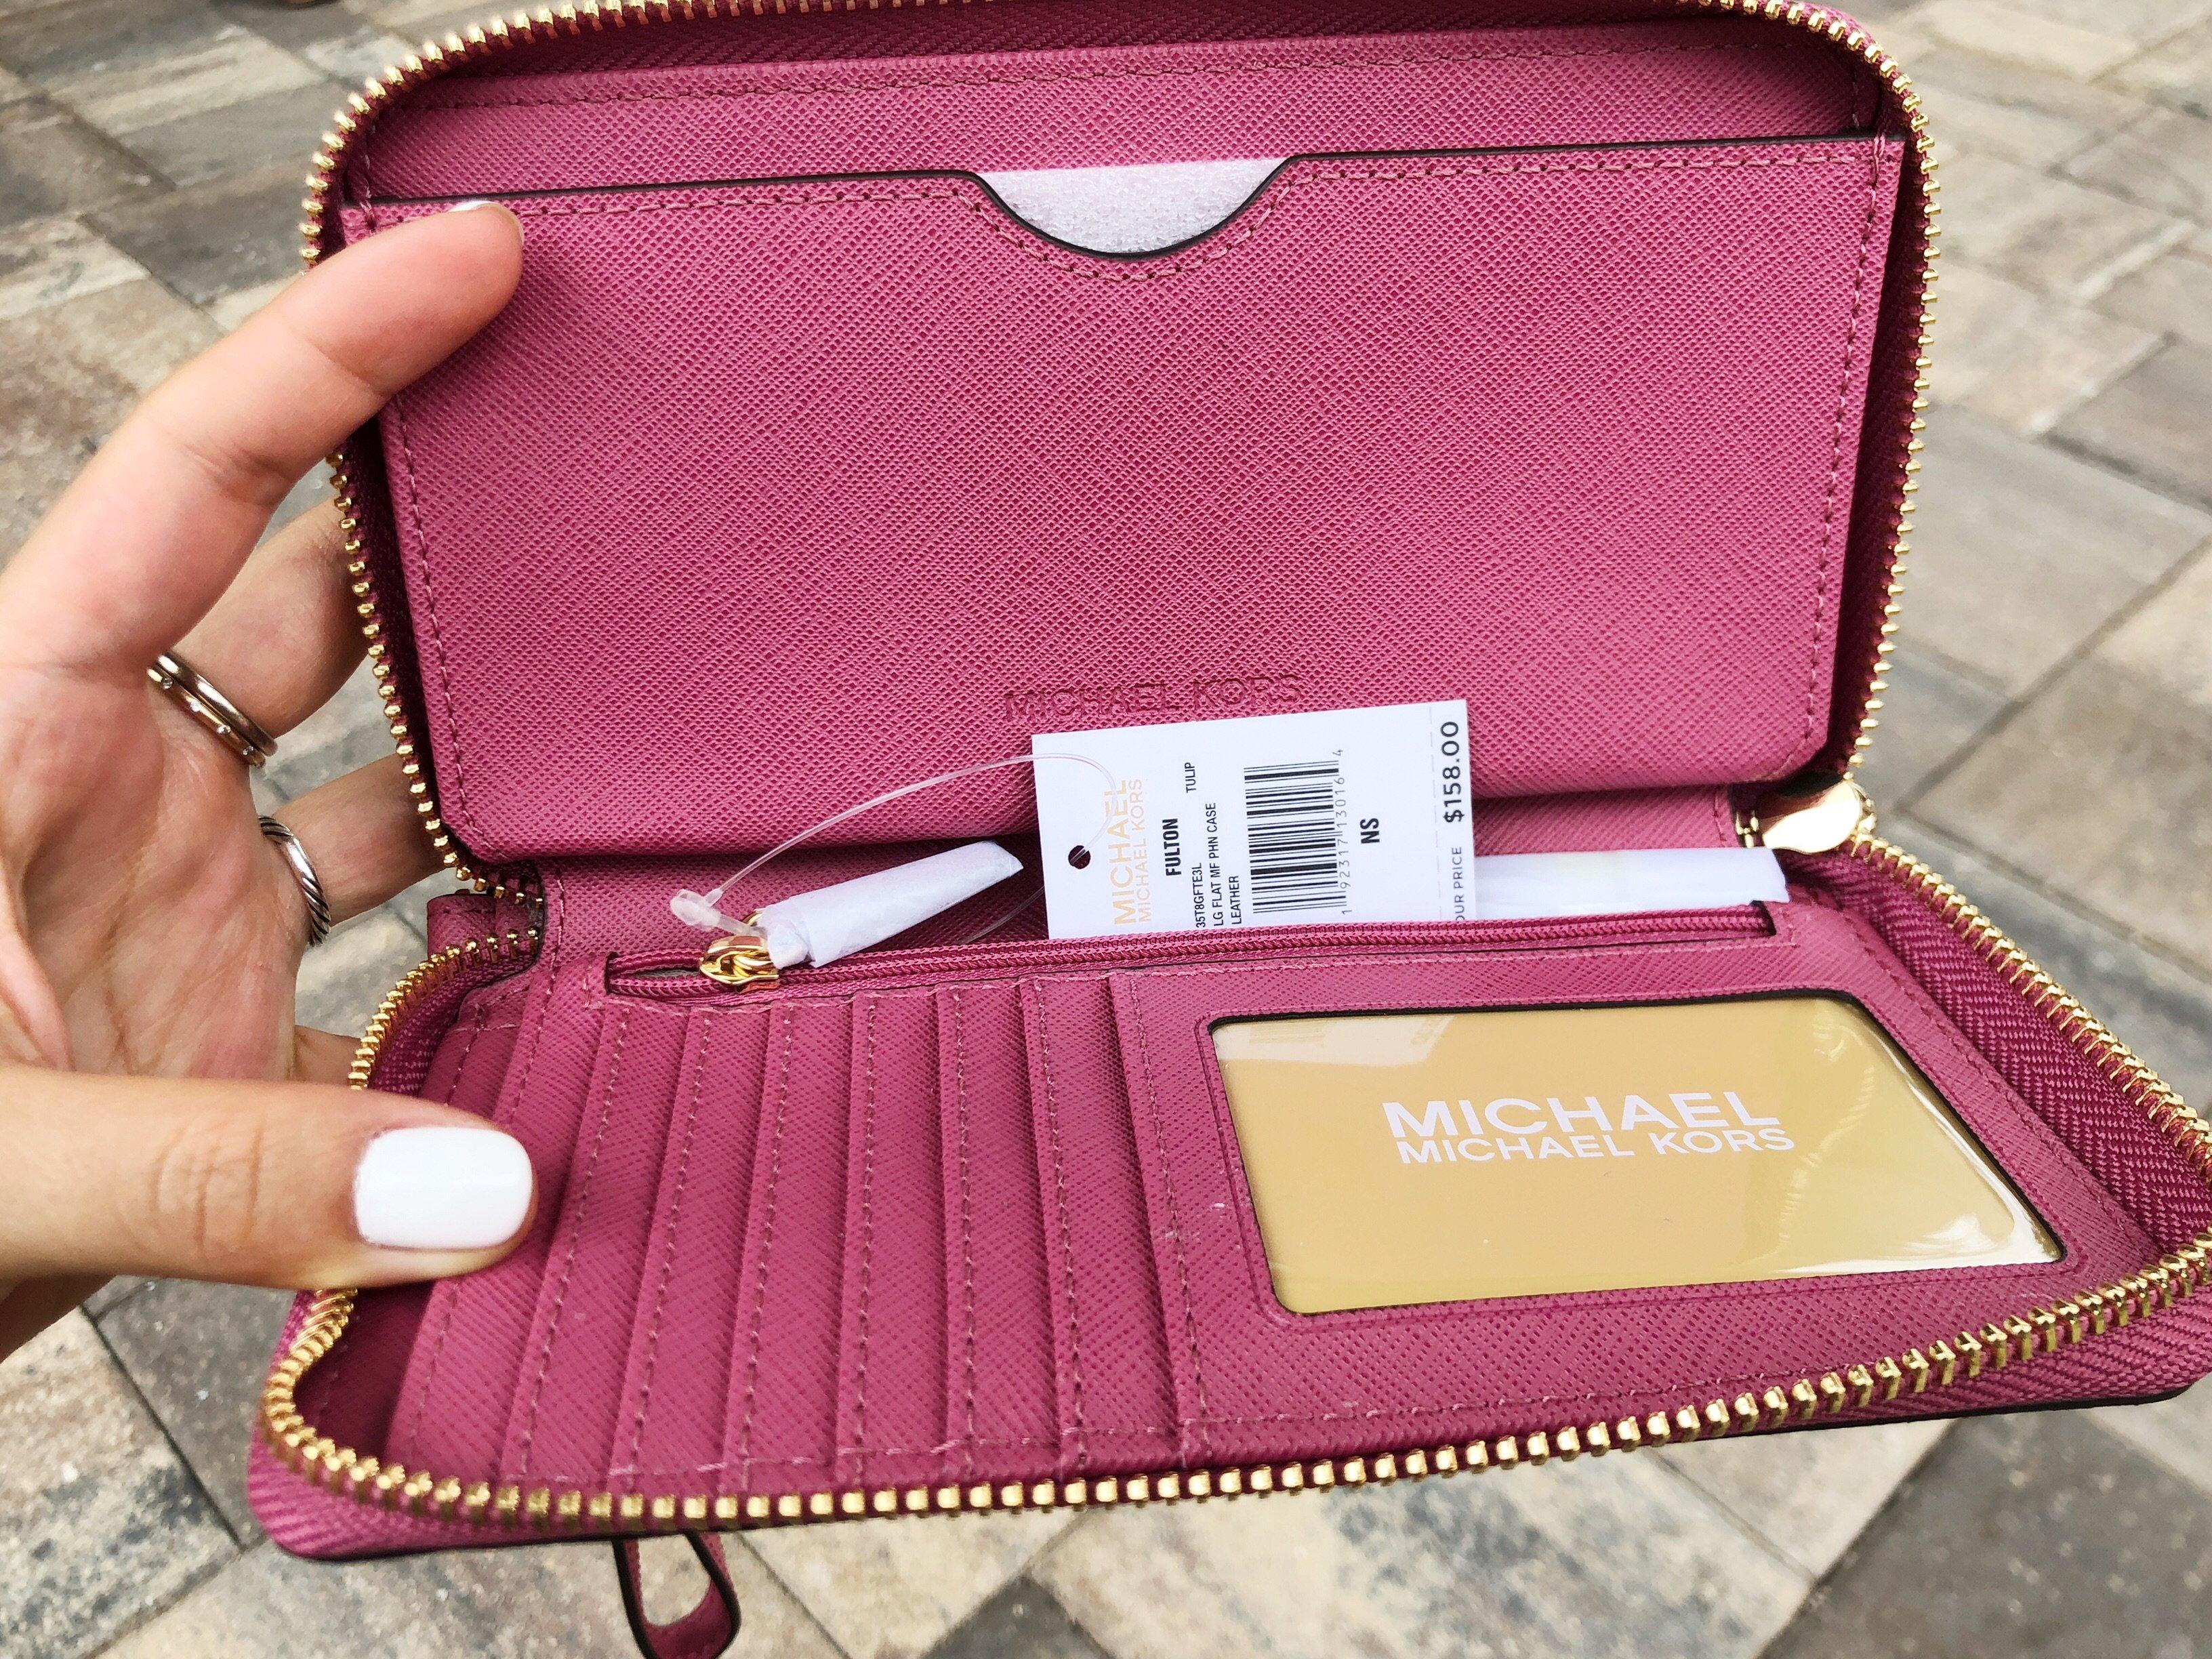 d03333784c25 Michael Kors Jet Set Travel Wallet Phone Wristlet Tulip Pink ...